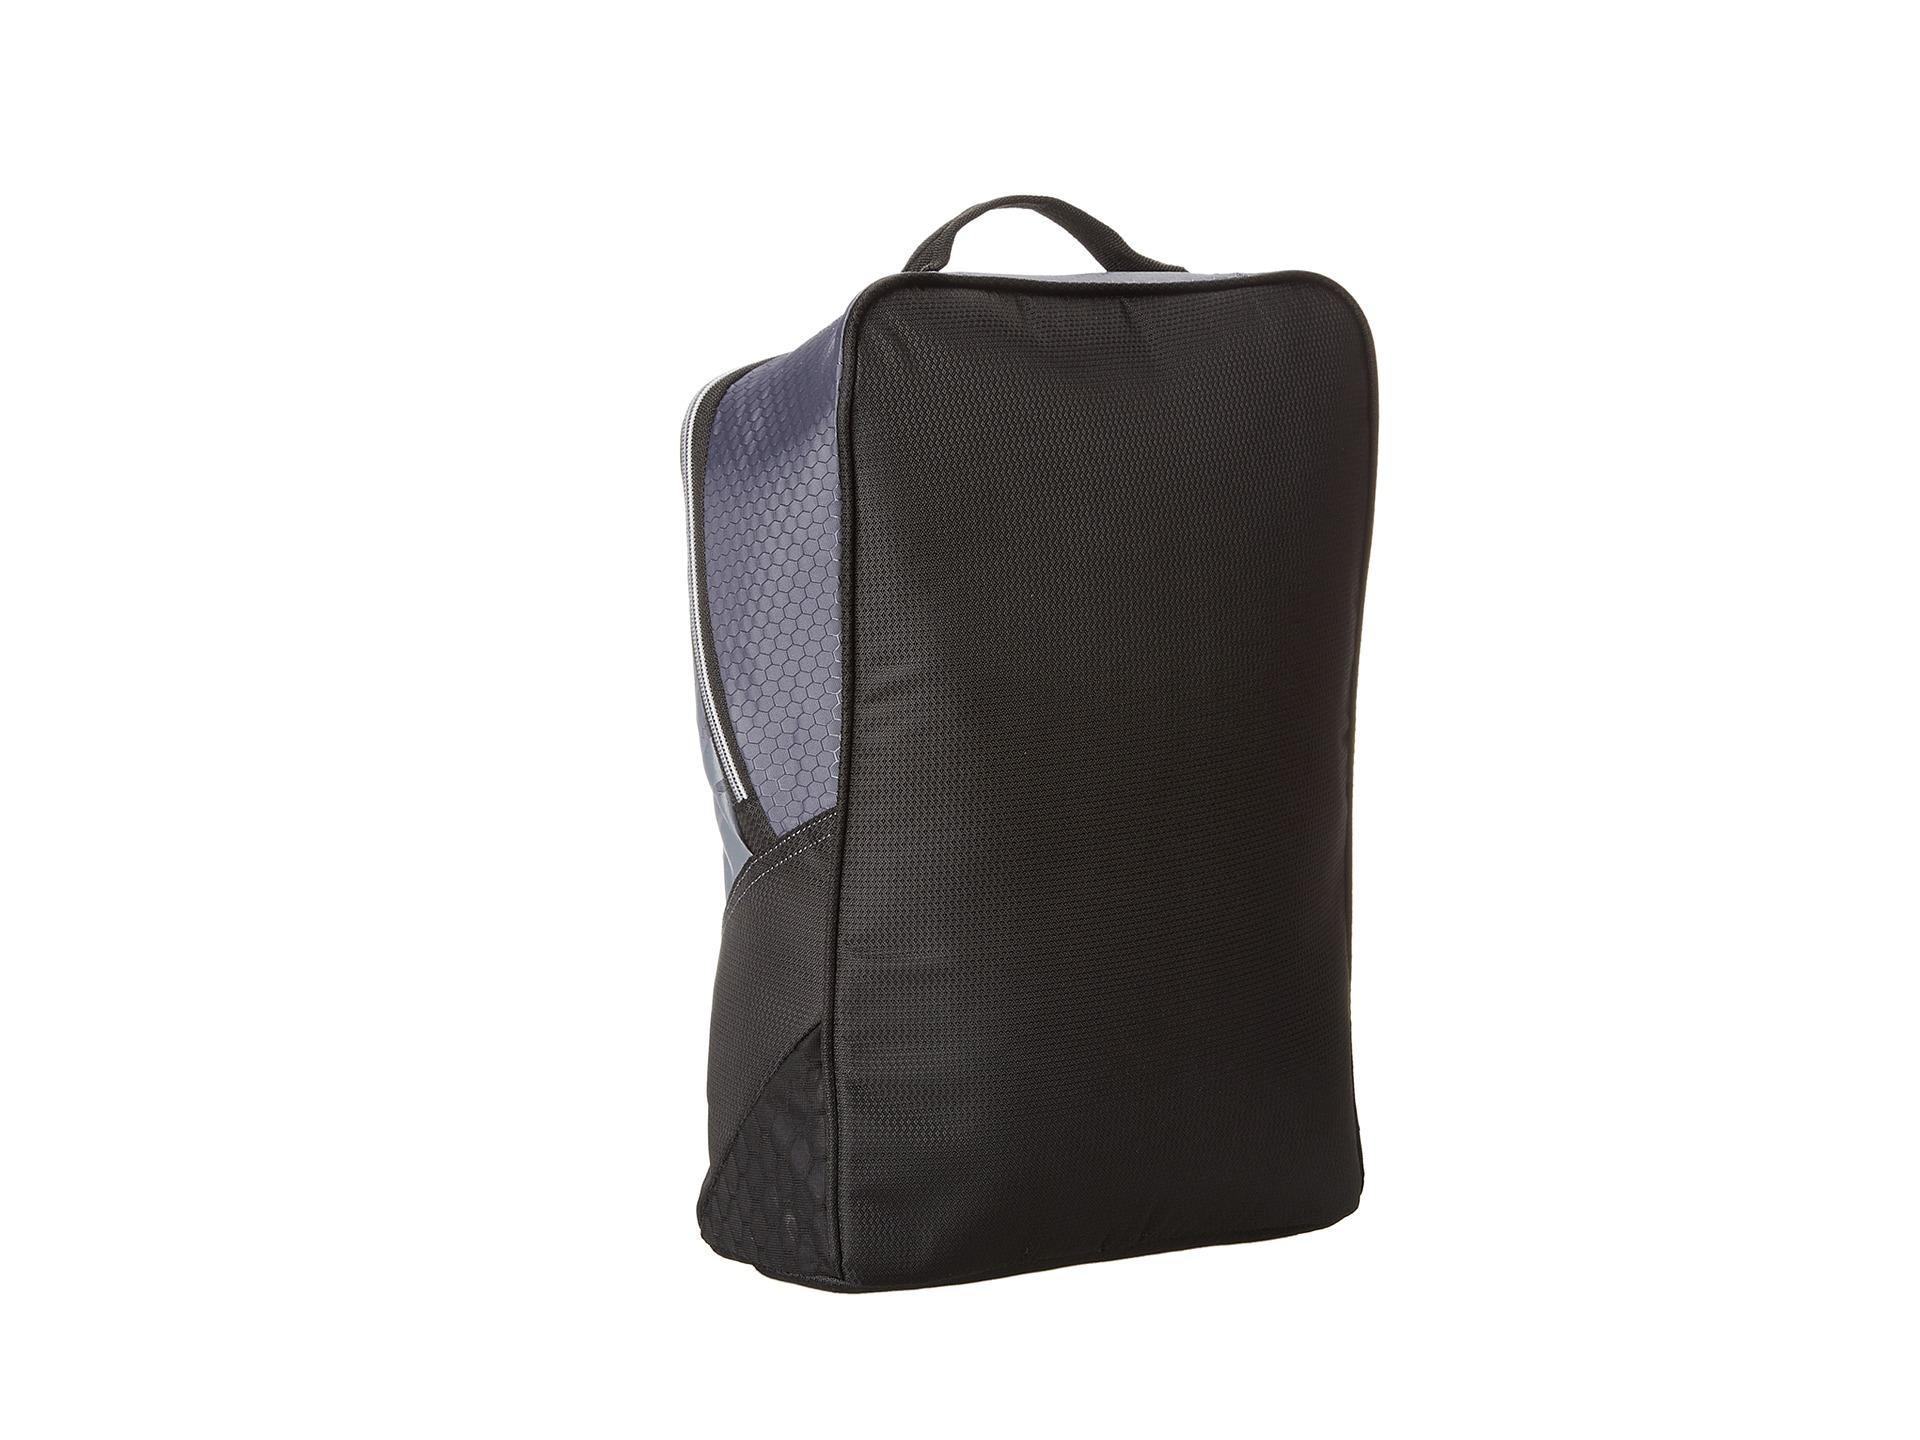 callaway travel gear sport shoe bag grey shipped free at